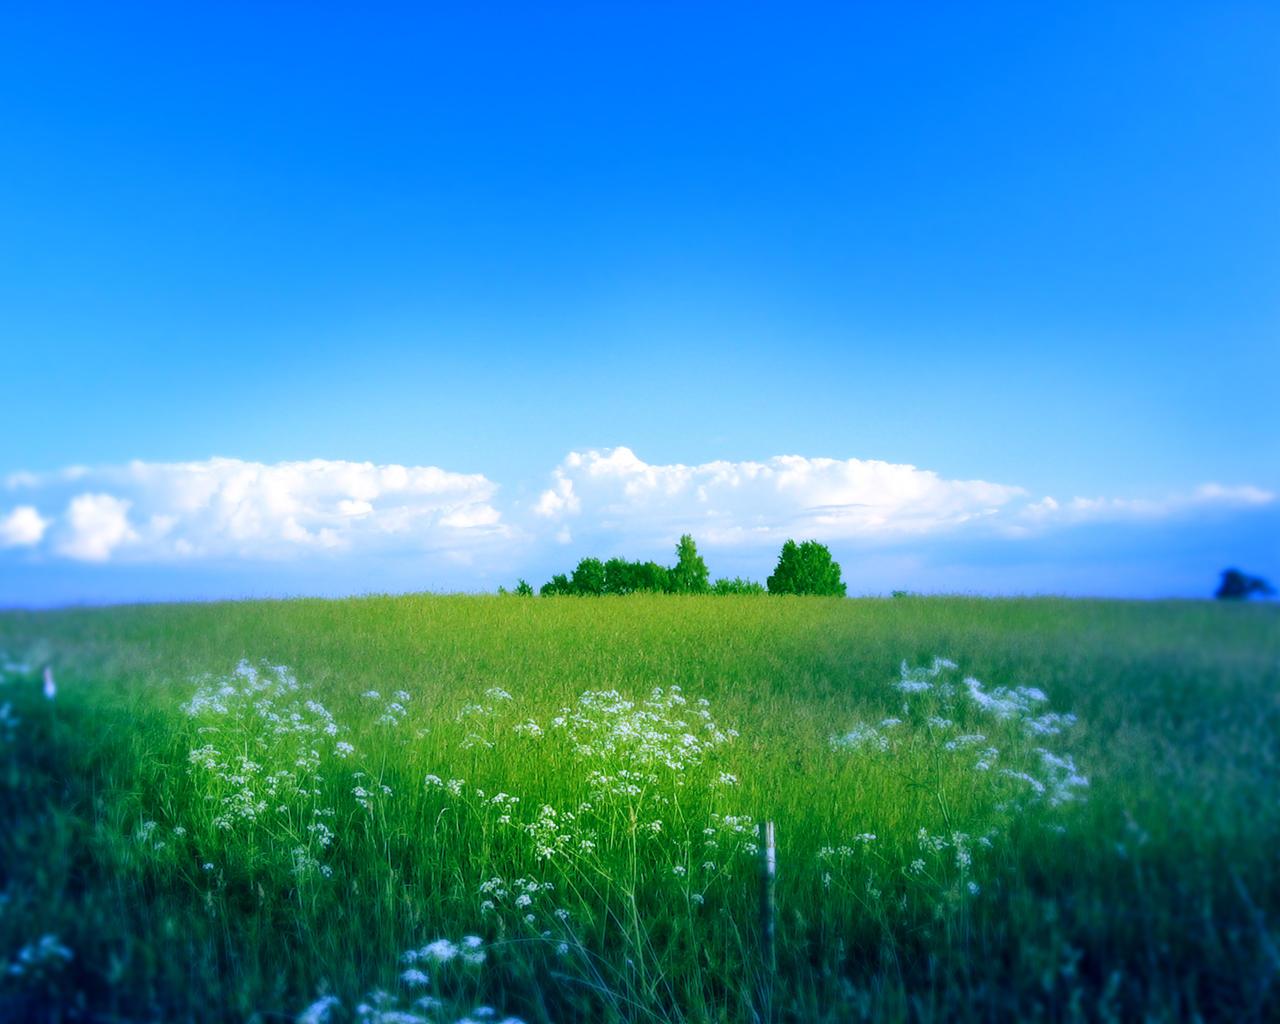 Field Plotter by itsaju